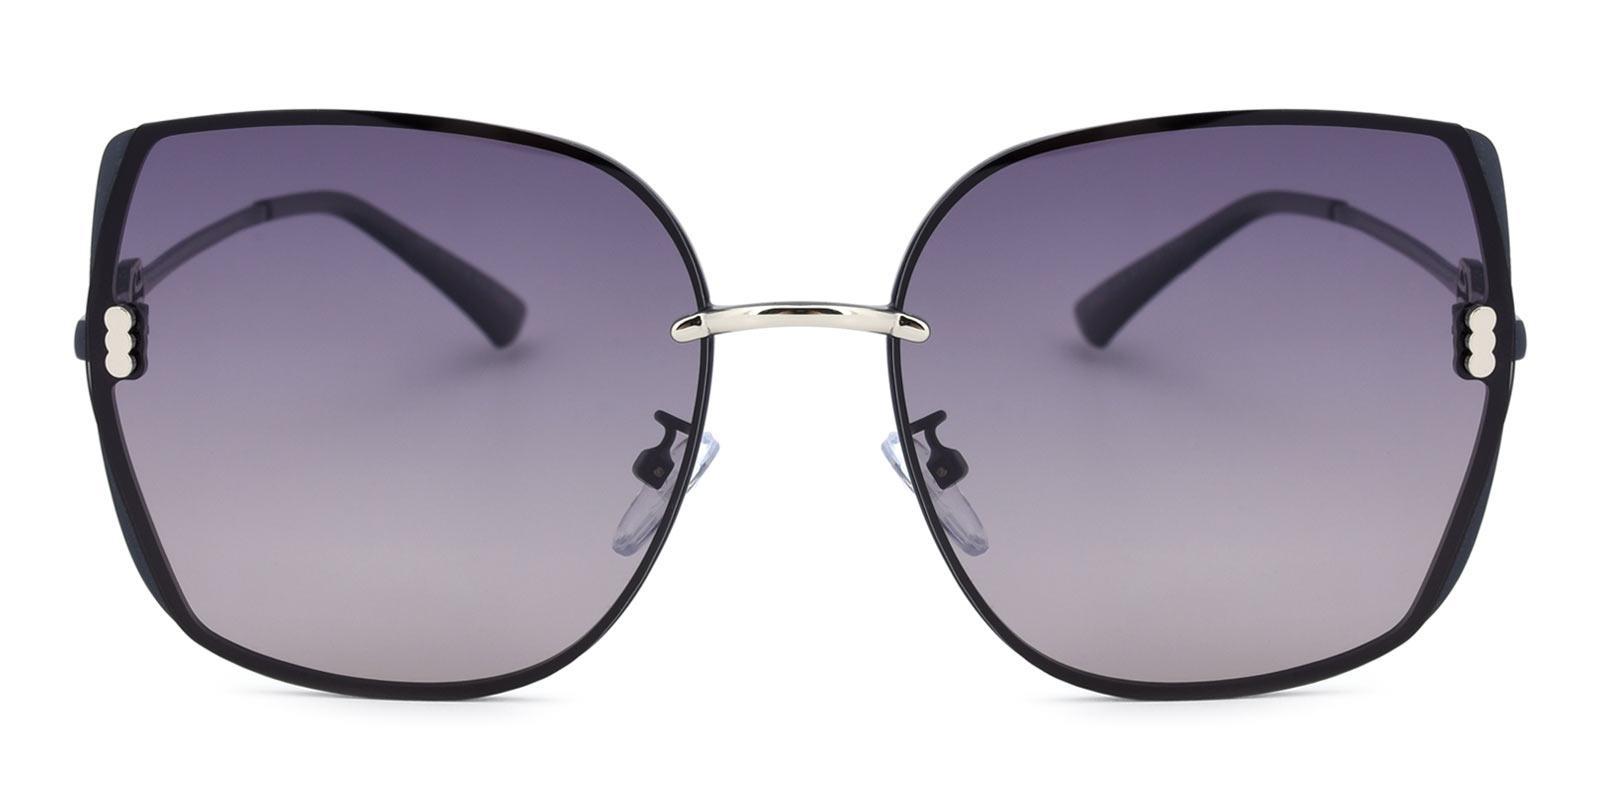 Zed-Gray-Square-Metal-Sunglasses-detail